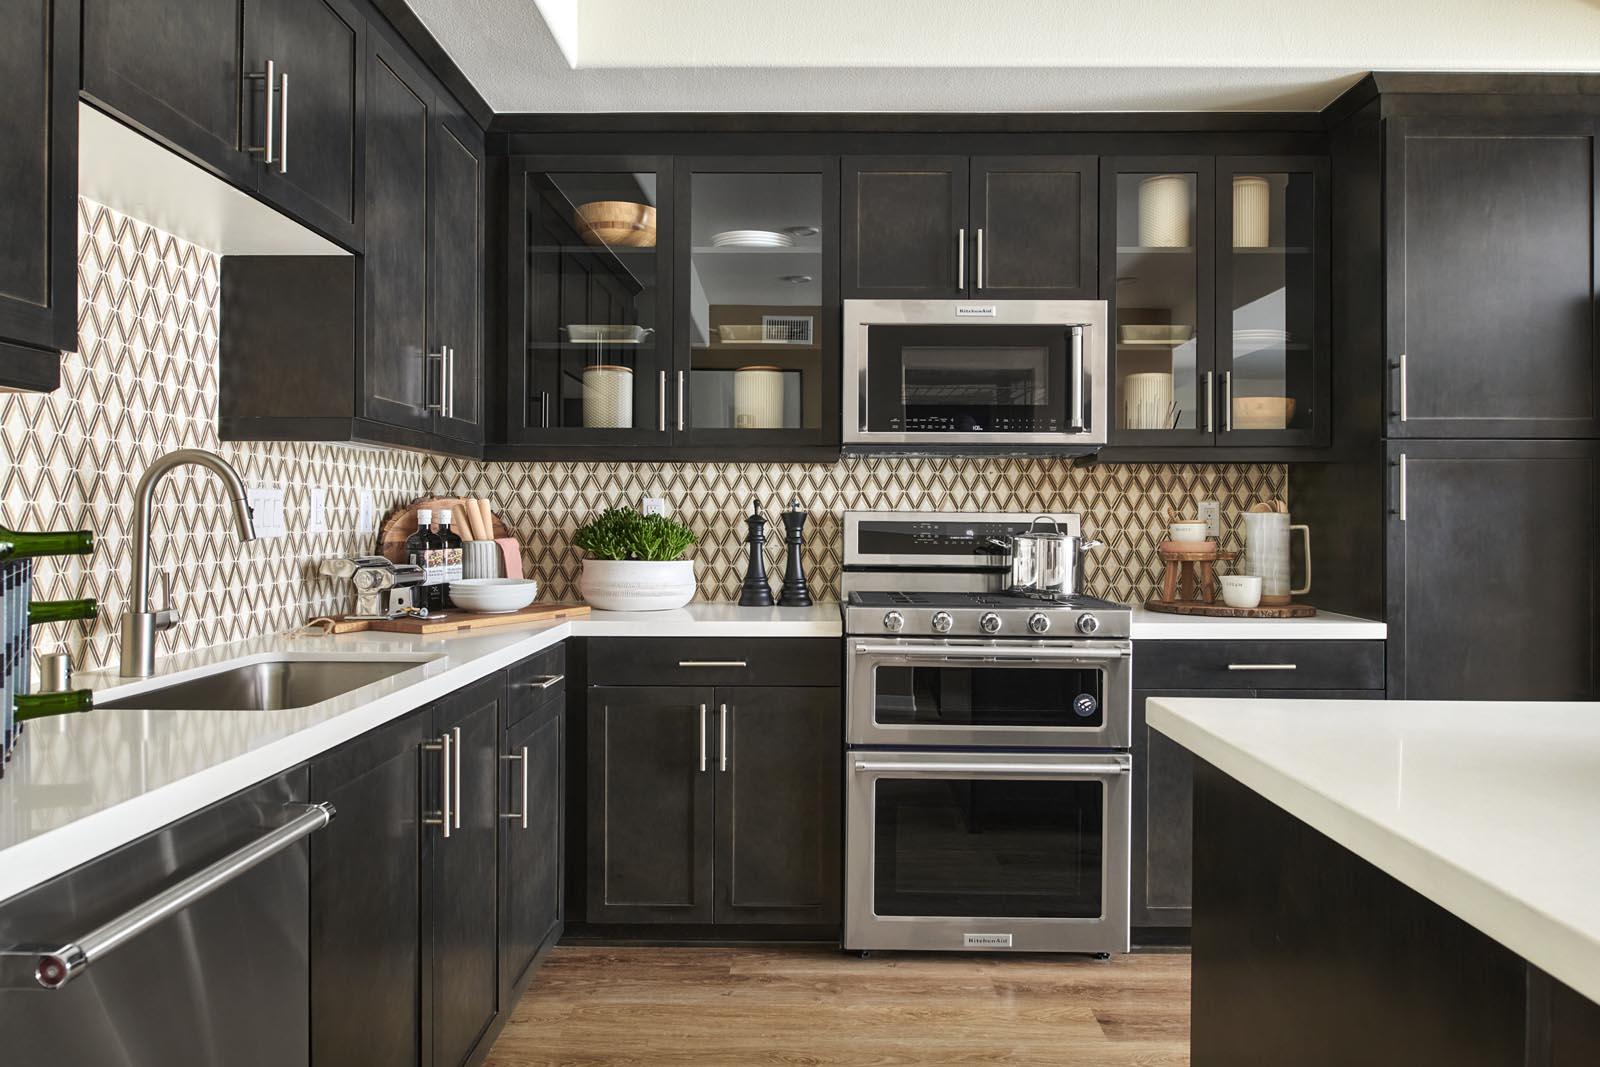 Kitchen | Residence 5 | Aspire | New Homes in Rancho Cucamonga, CA | Van Daele Homes